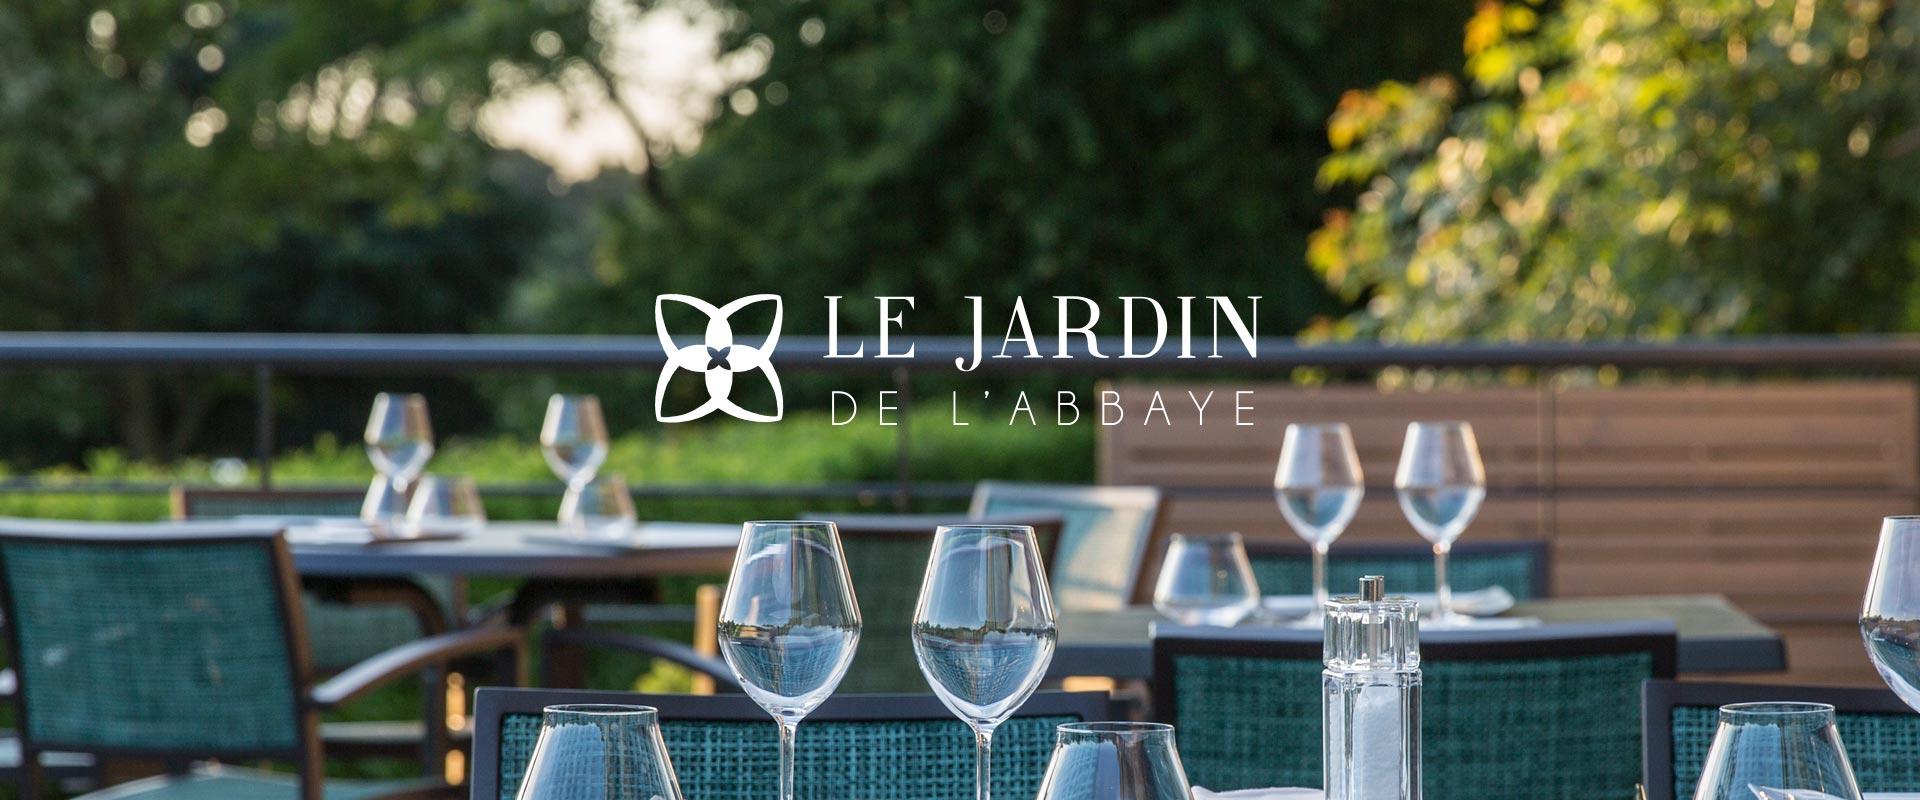 Restaurant le jardin de l 39 abbaye hotel restaurant st malo - Hotel de mougins restaurant le jardin ...